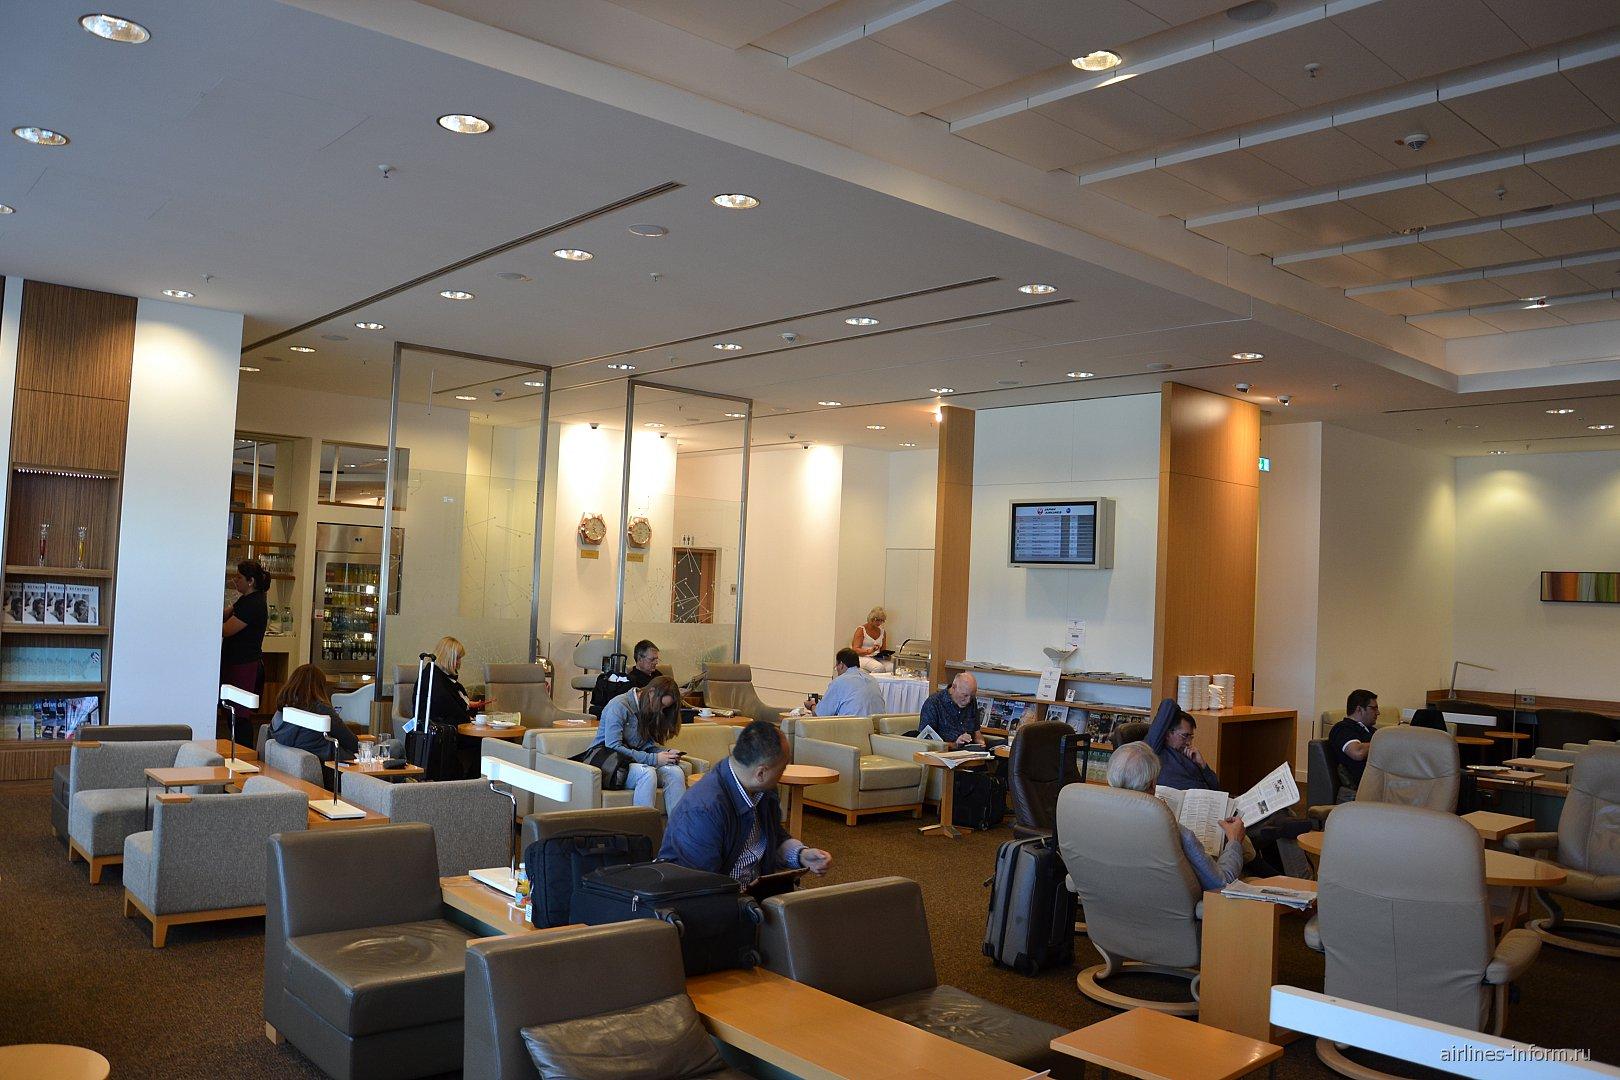 Бизнес-зал JAL в терминале 1 аэропорта Франкфурт